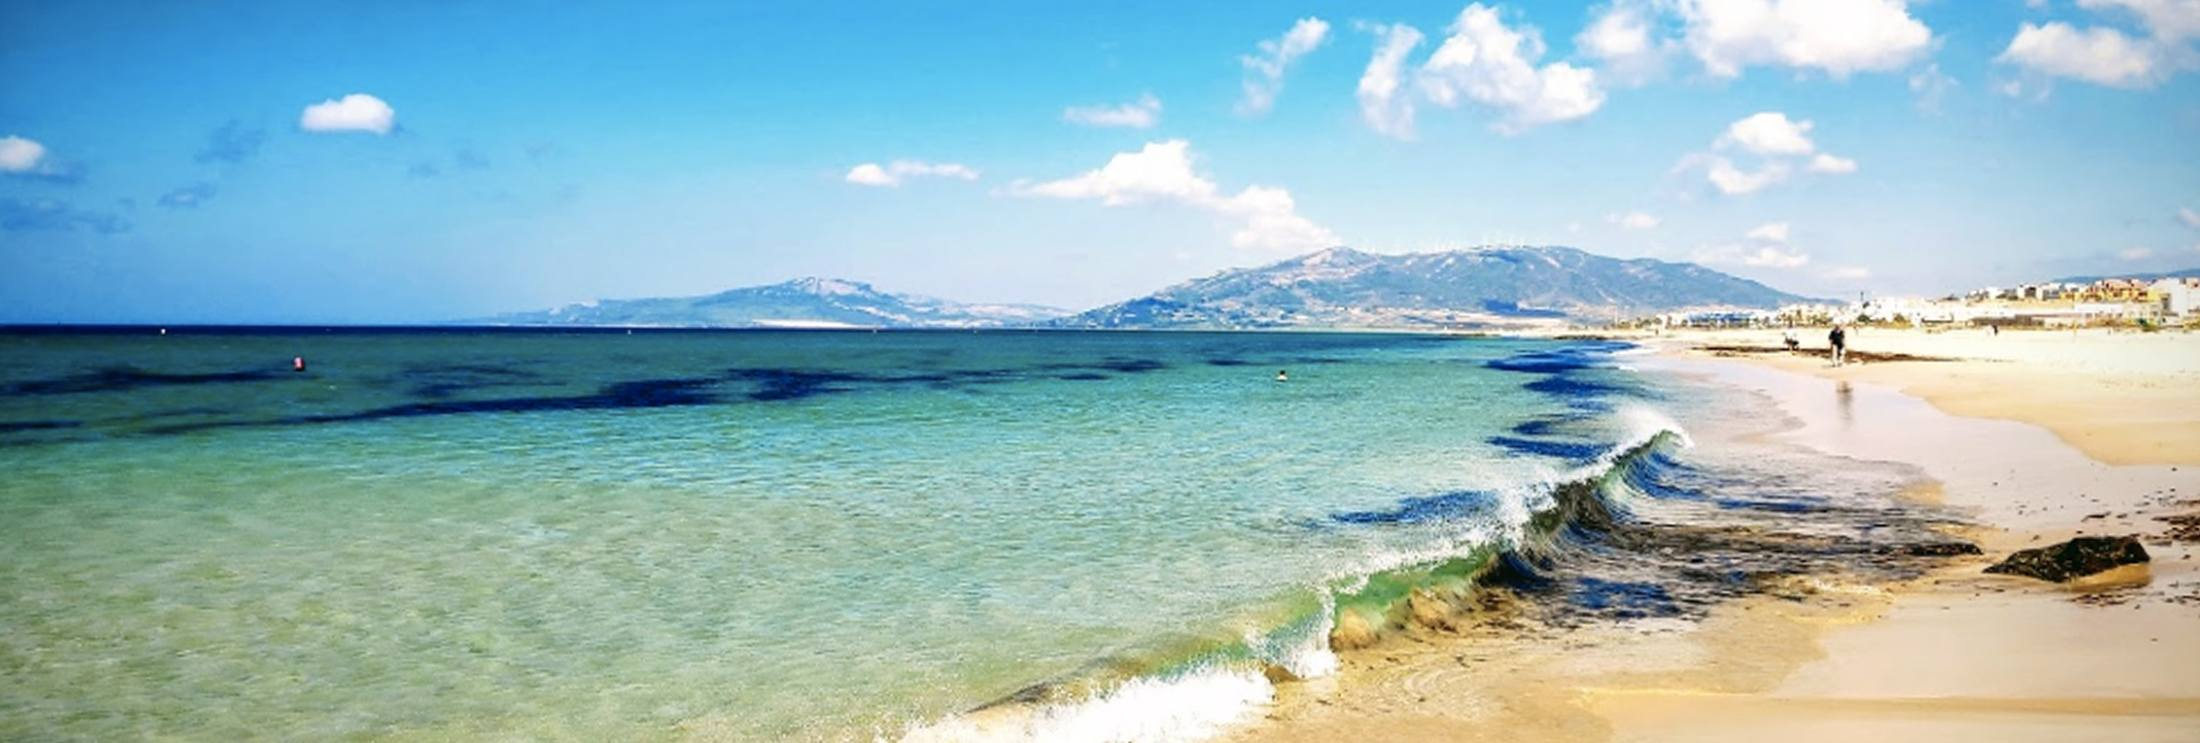 Plage de Balneario ou Playa Chica à Tarifa en Espagne